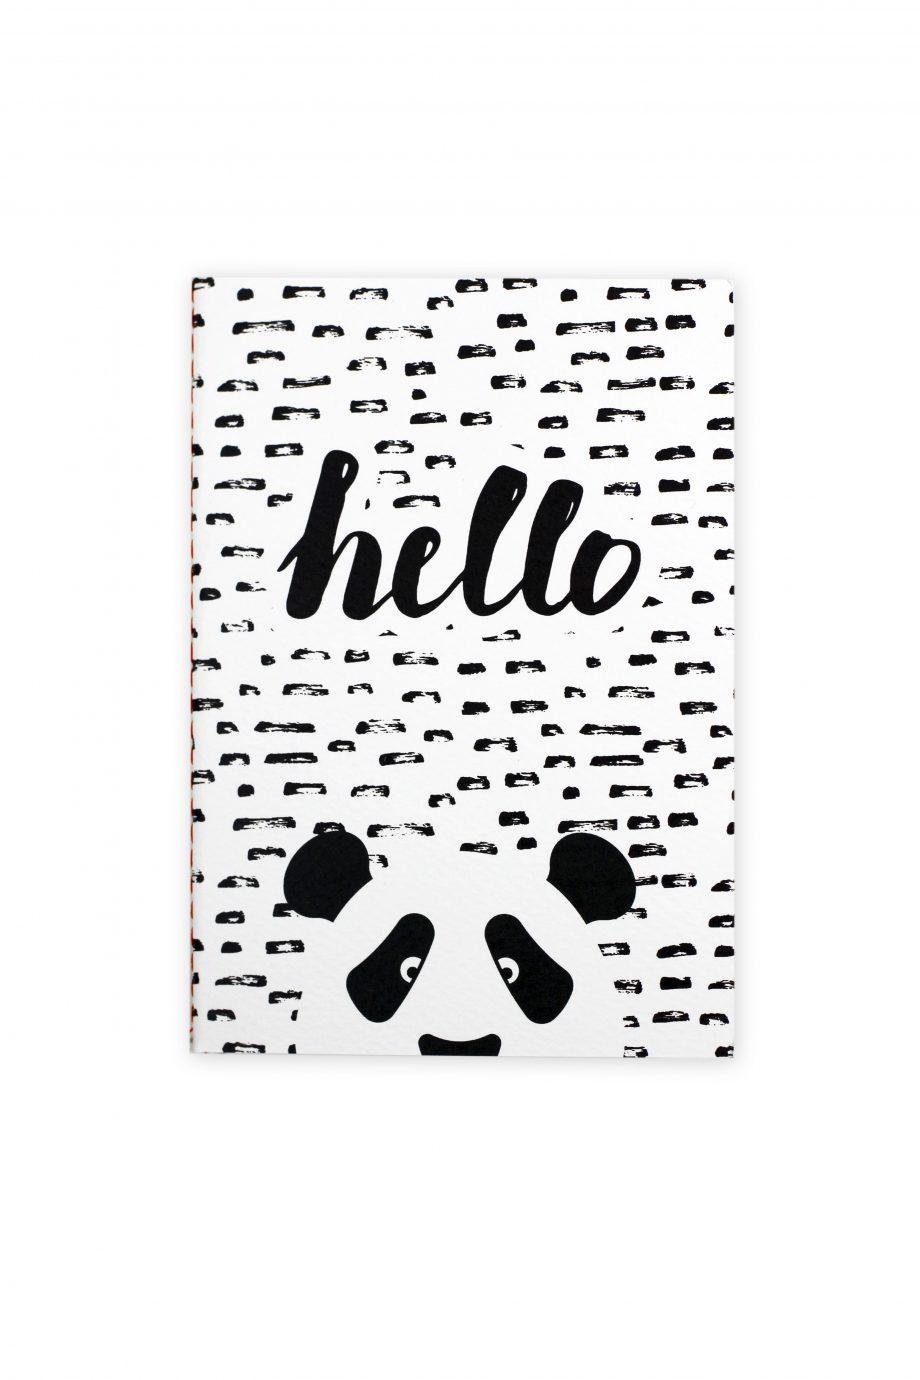 Panda-frente1